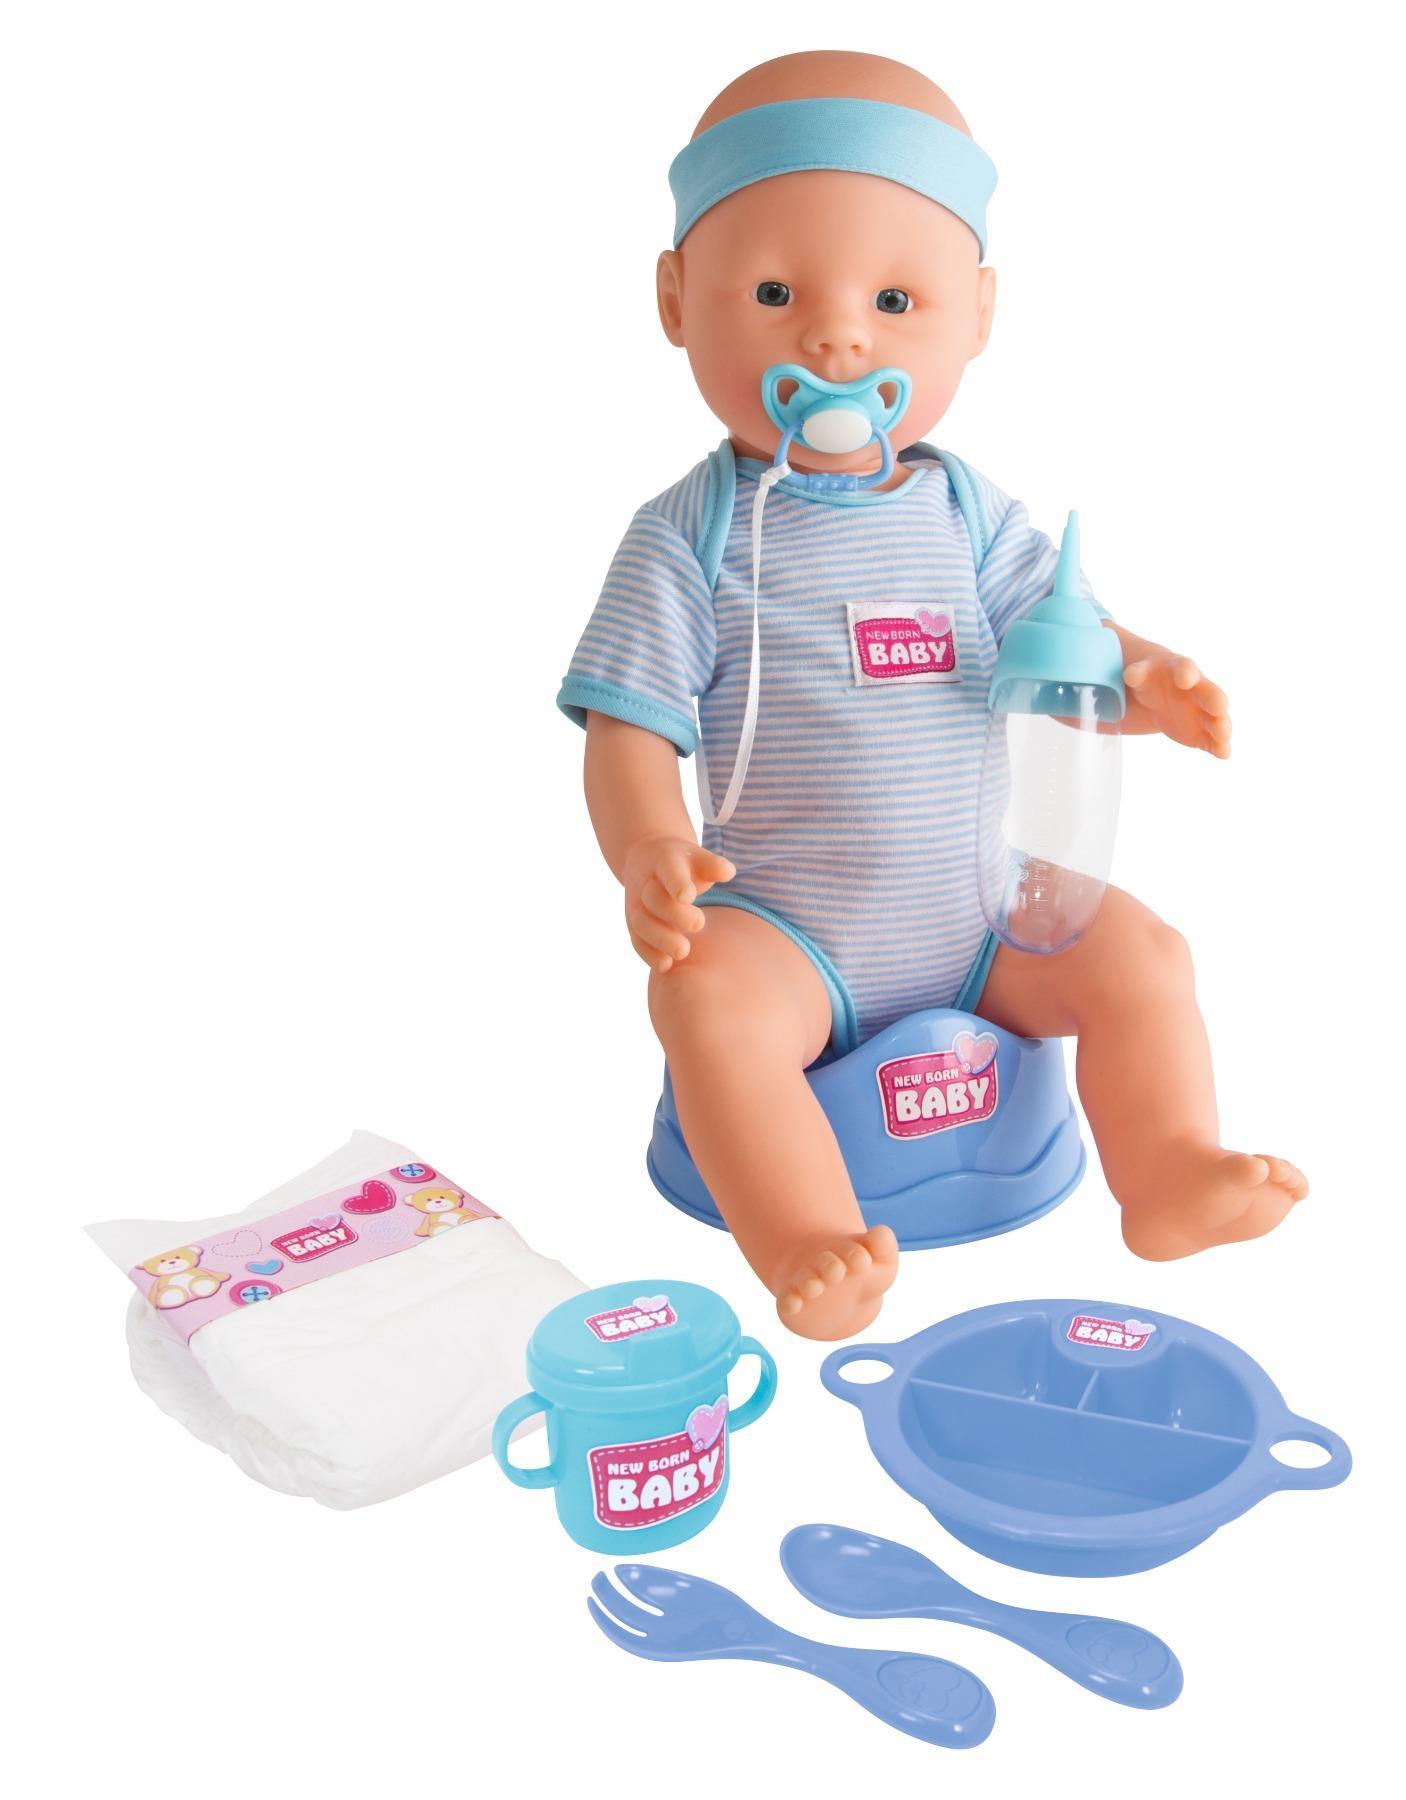 simba 105030044 new born baby puppen junge 43 cm. Black Bedroom Furniture Sets. Home Design Ideas